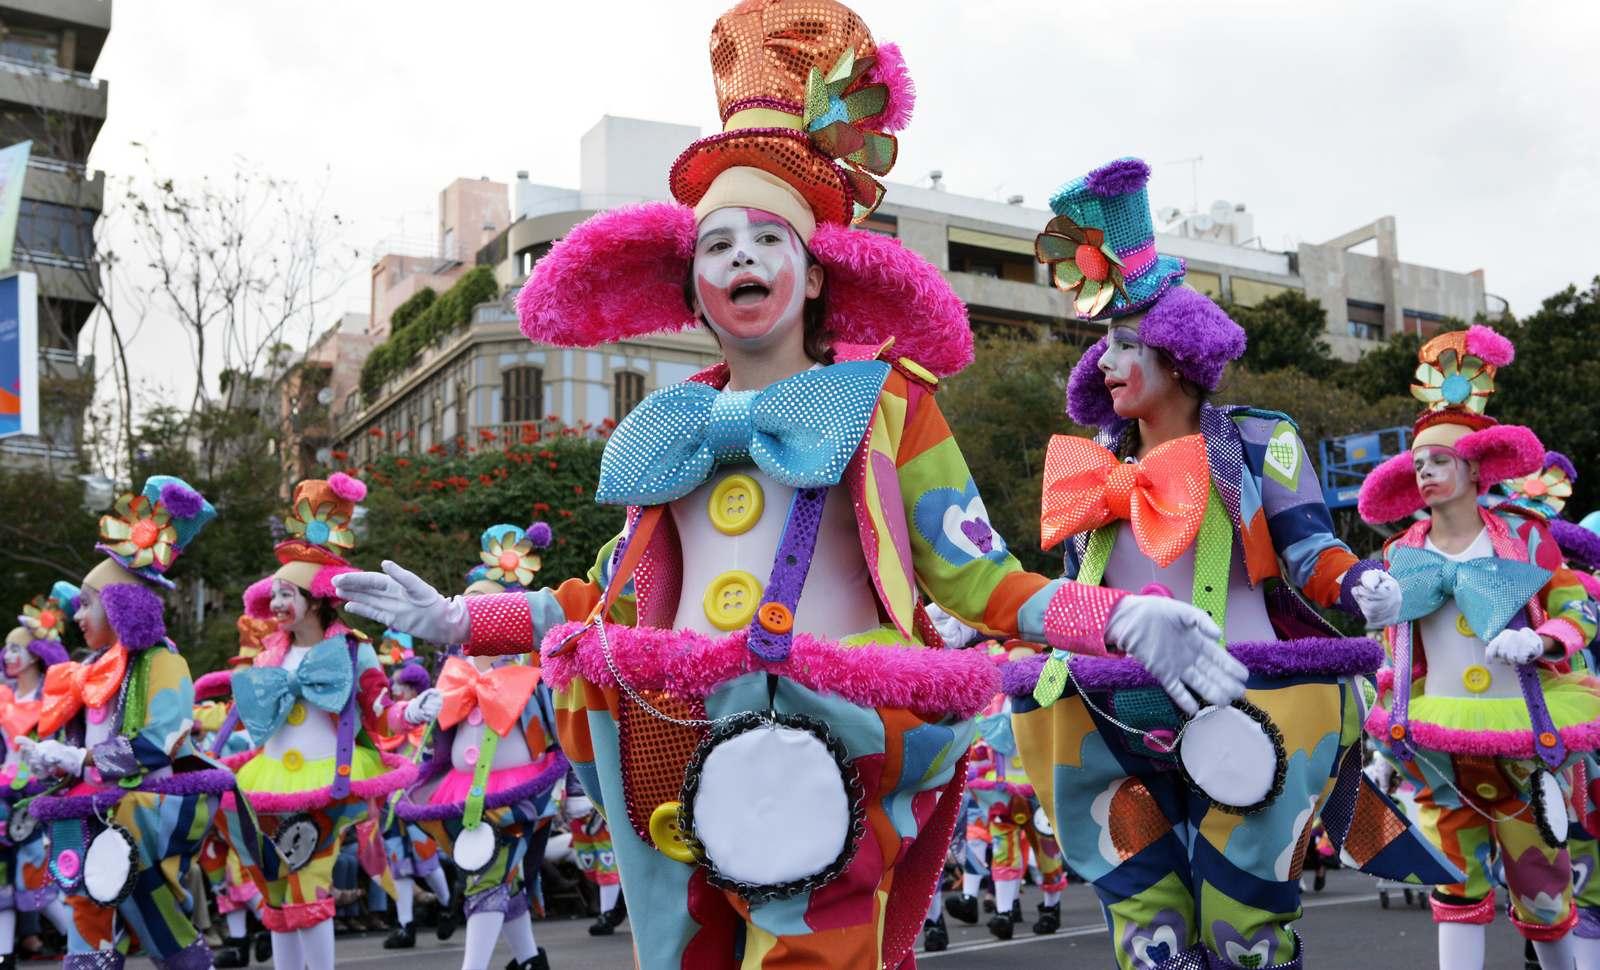 Carnaval carnaval trendy children blog de moda infantil - Disfrazes para carnavales ...